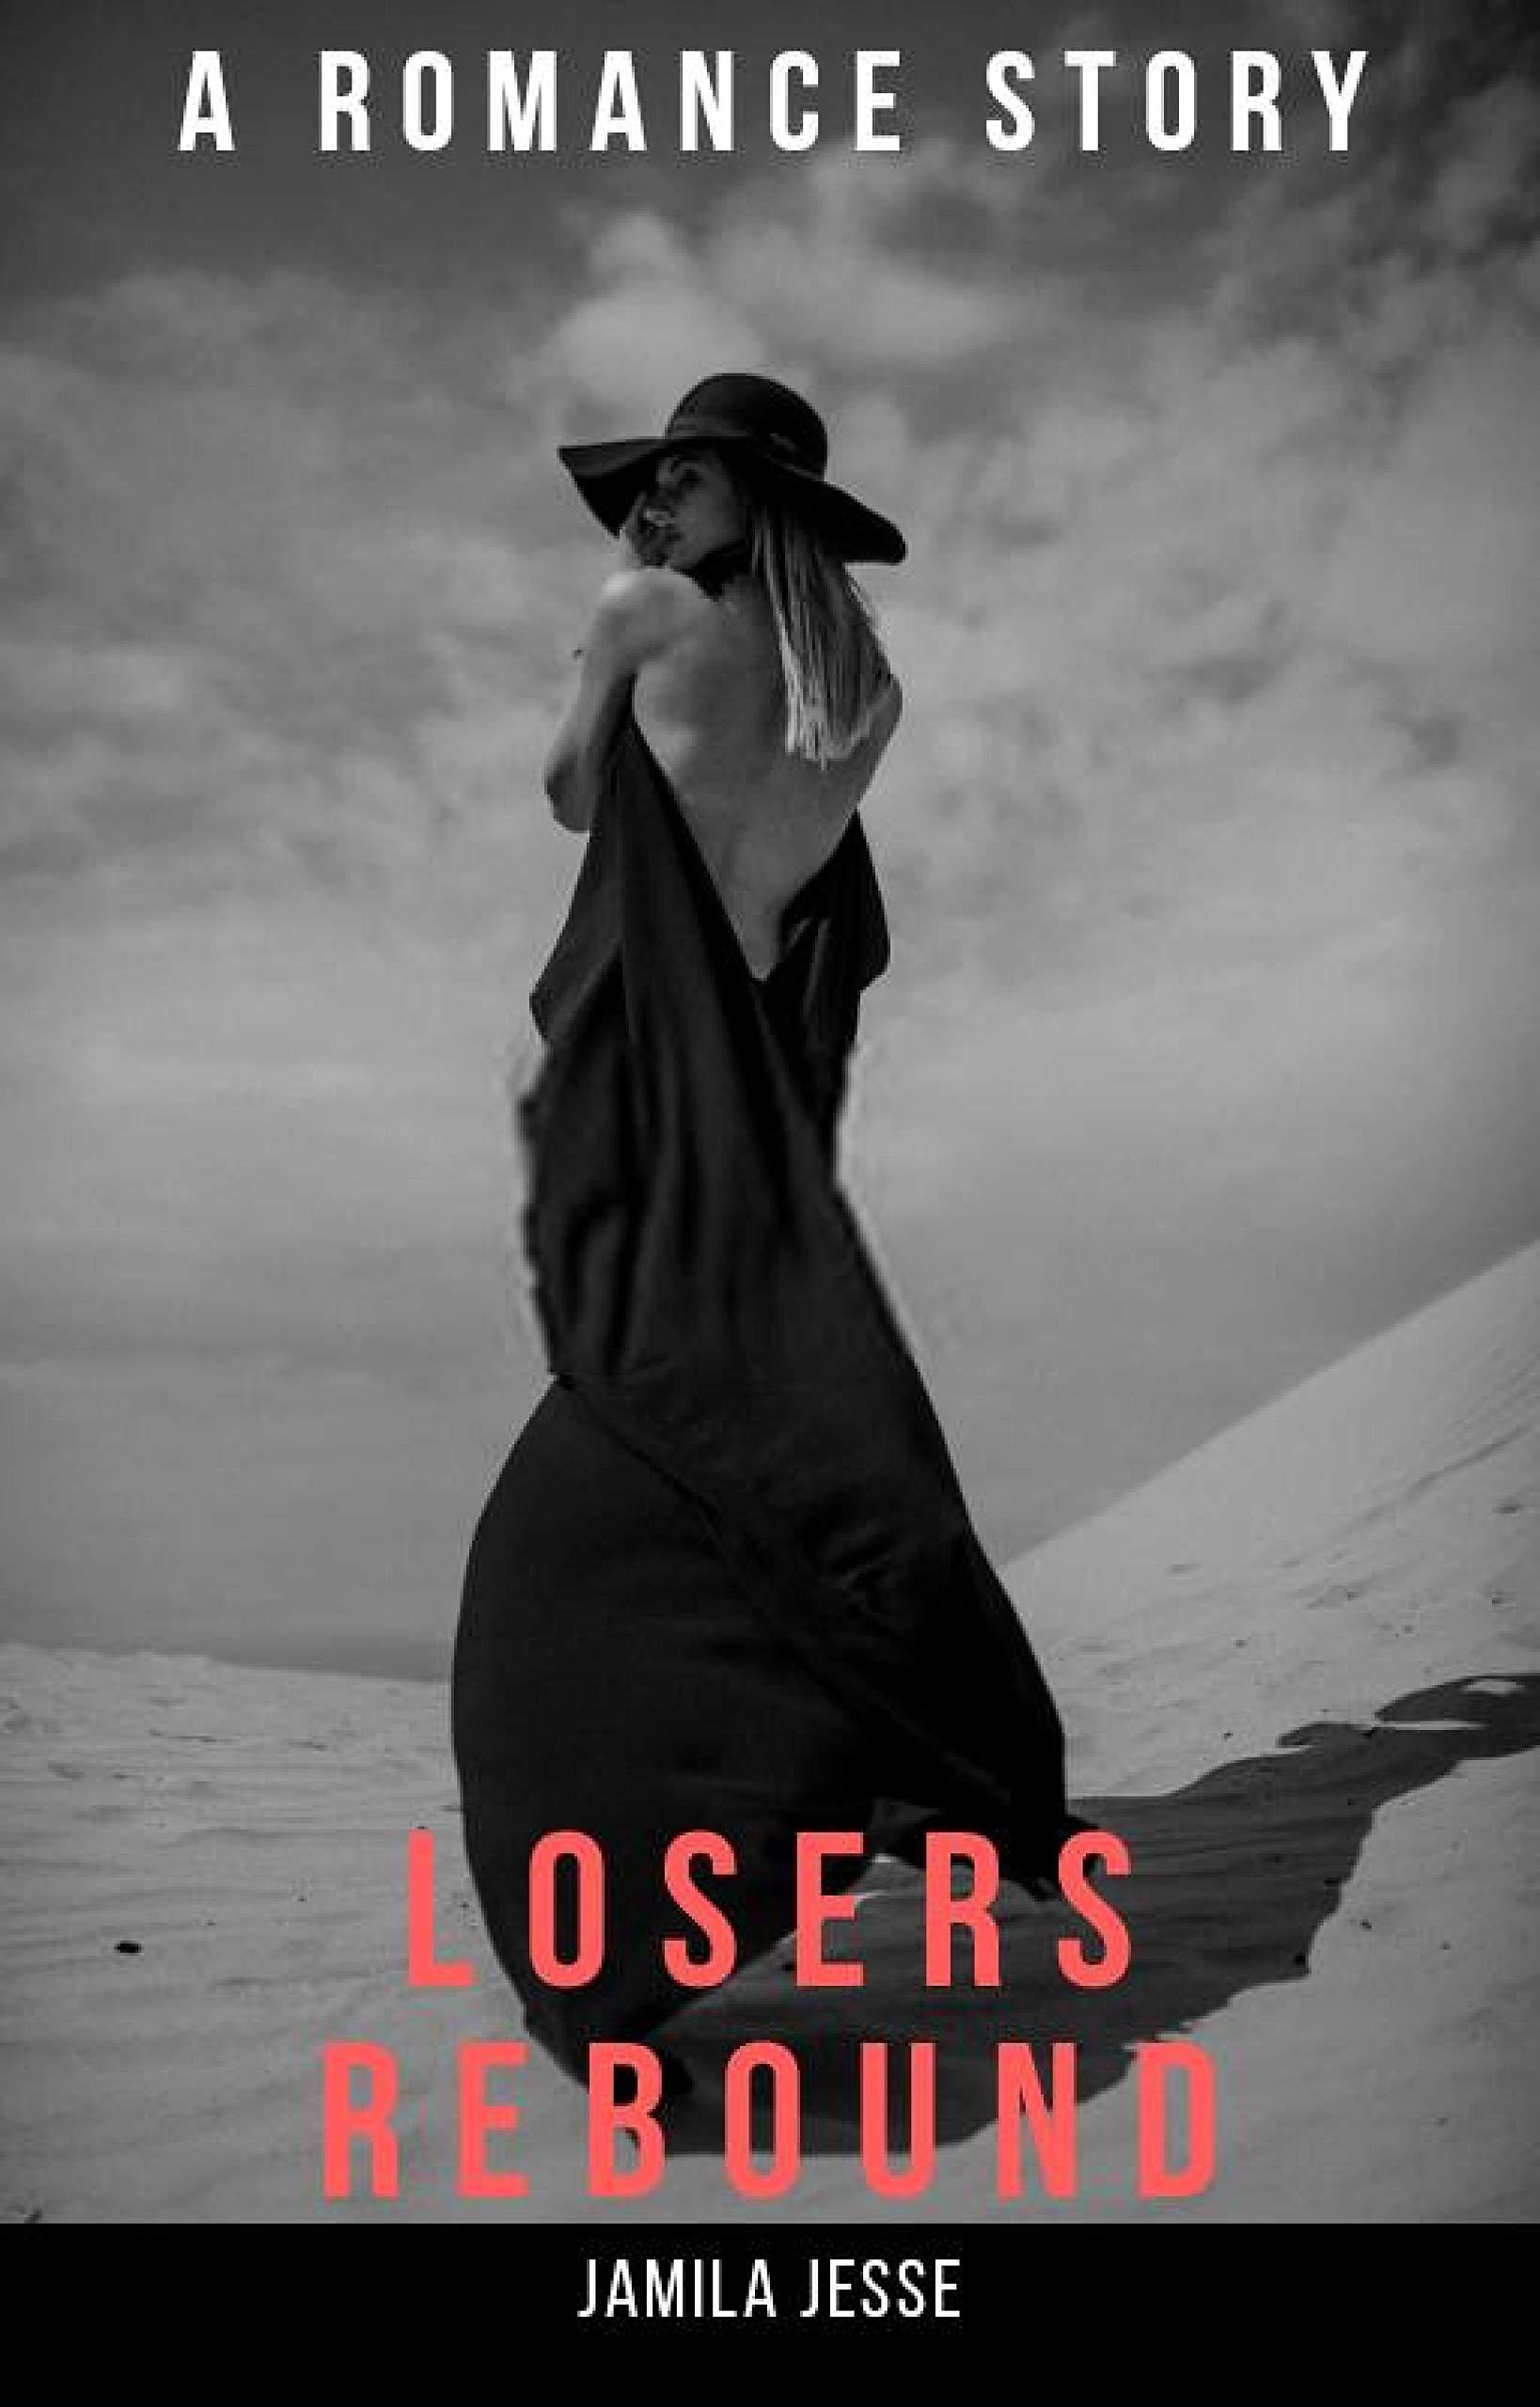 A LOSERS REBOUND: A Romance Tale PART II